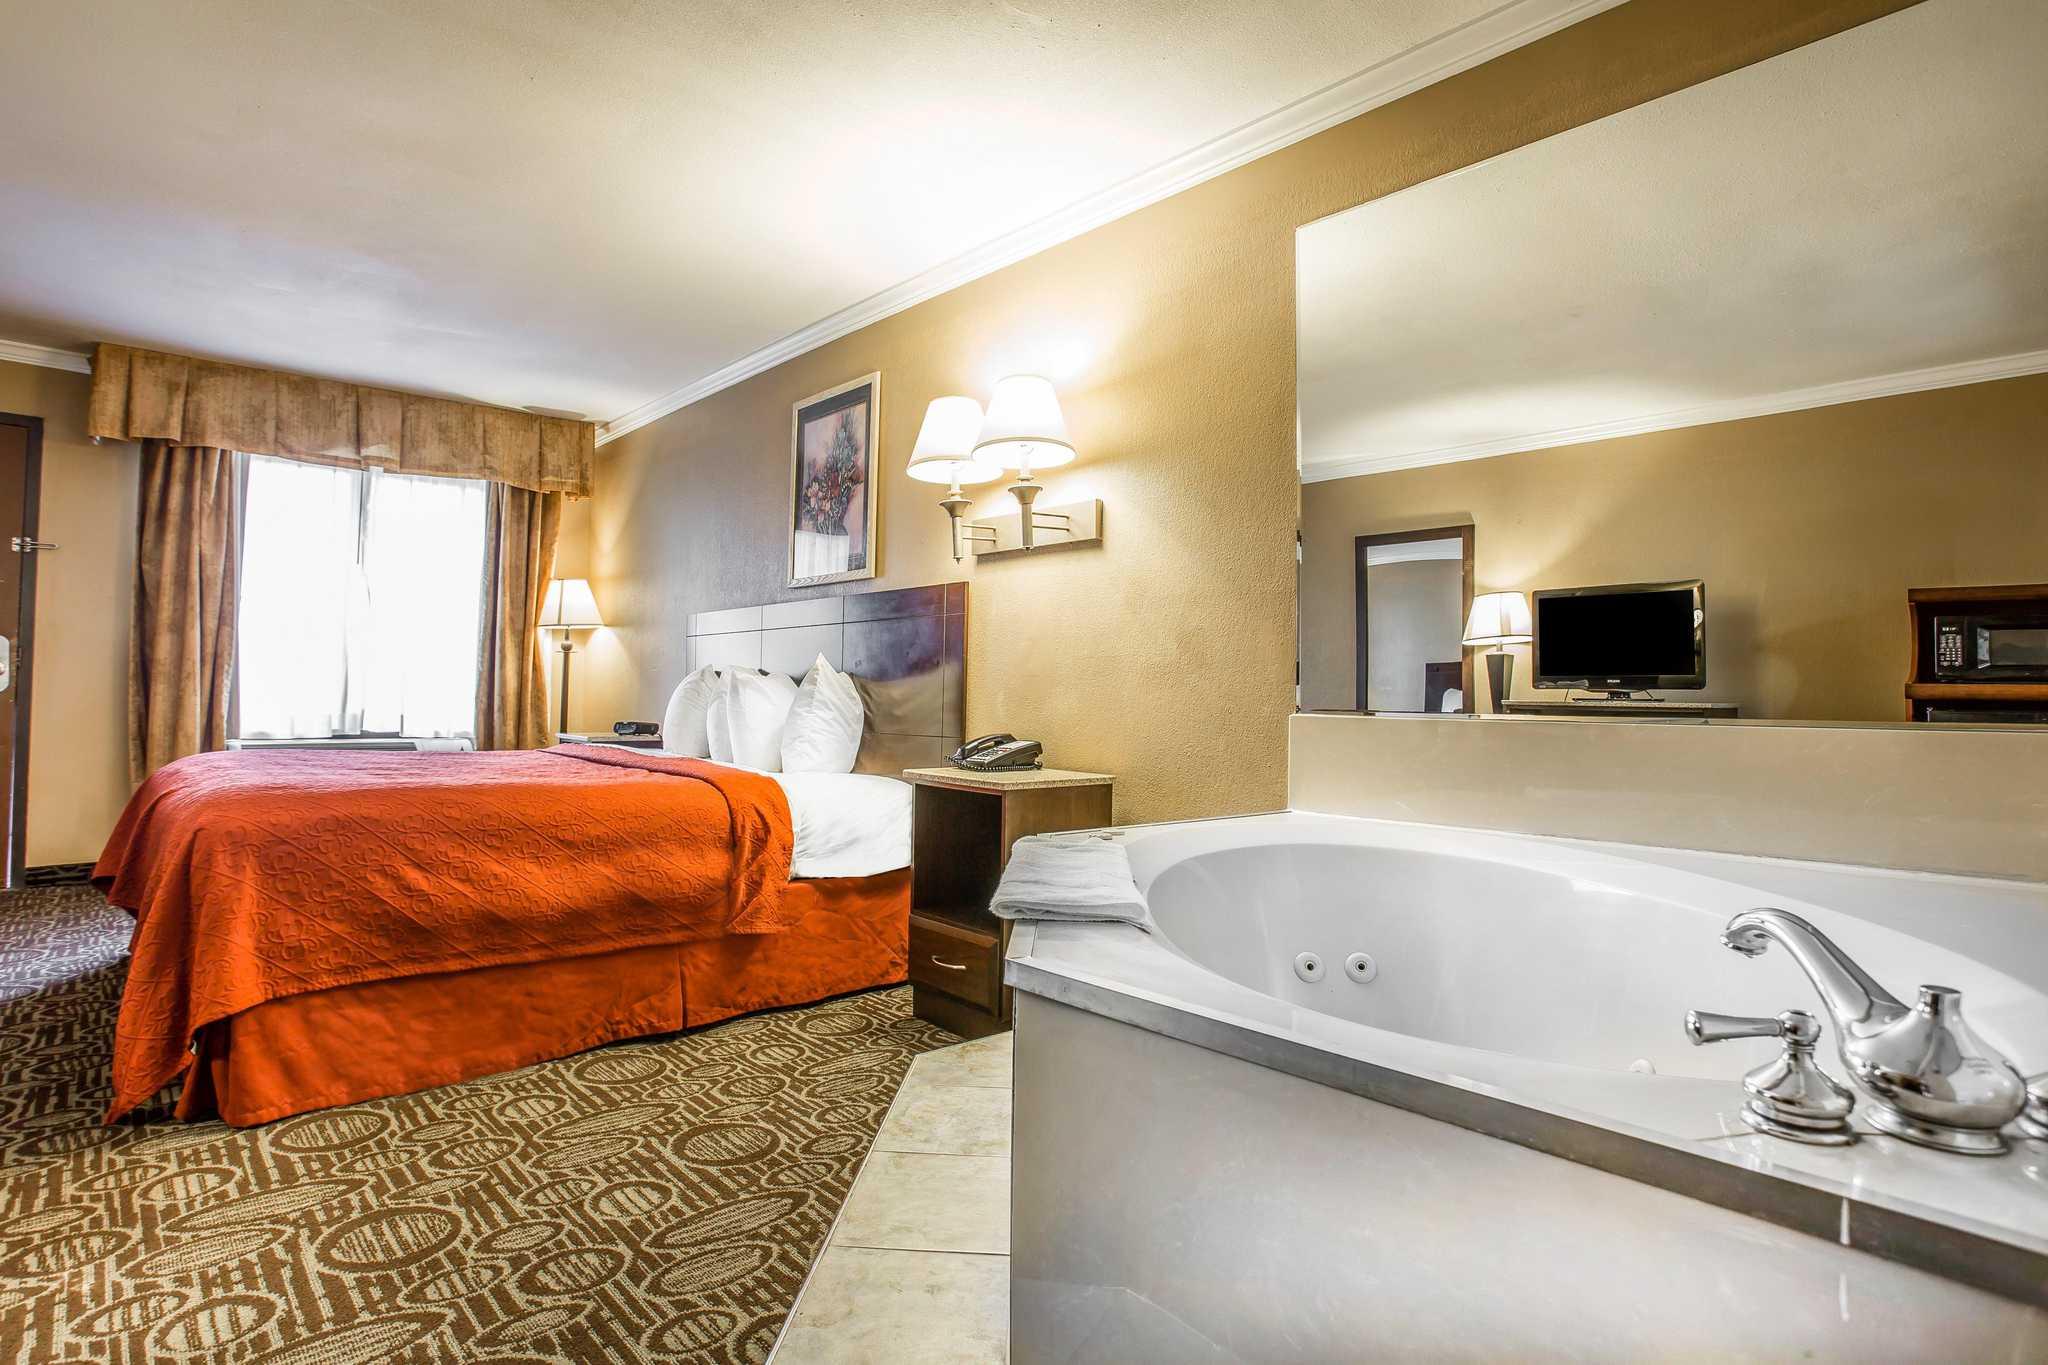 Quality Inn & Suites Ft. Jackson Maingate image 11